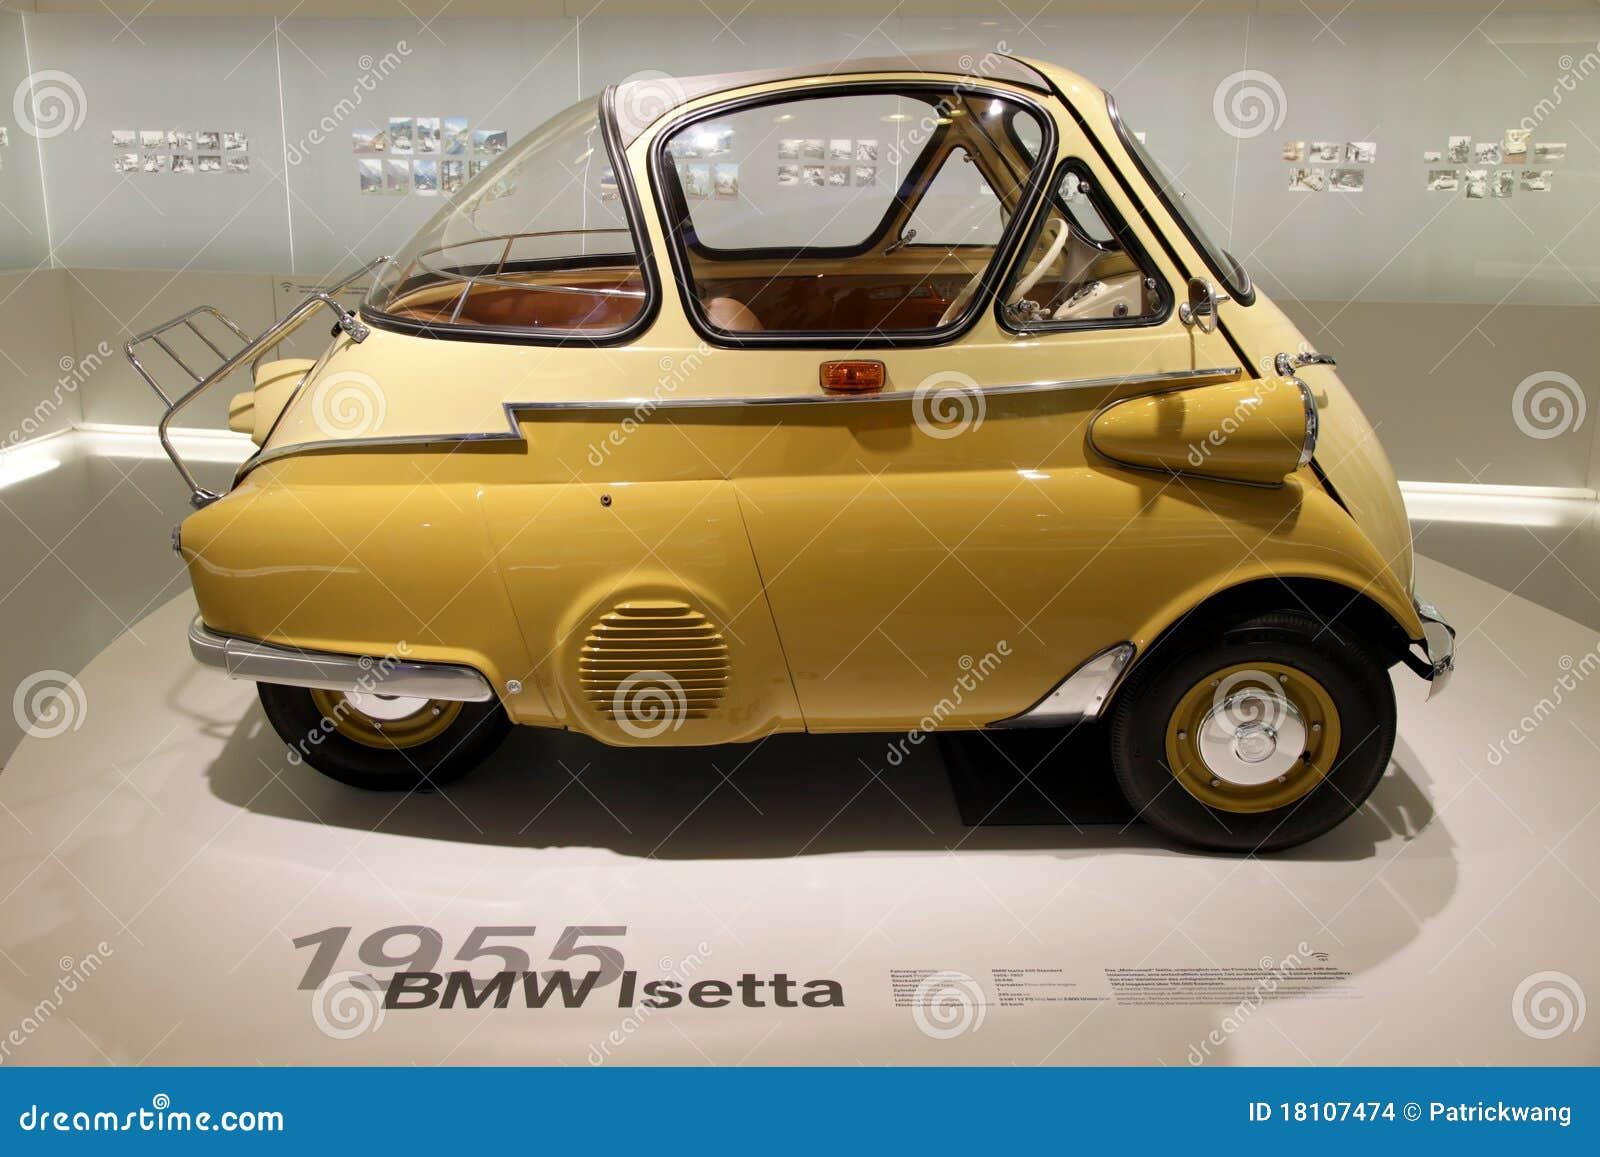 Bmw 1955 Isetta Editorial Stock Image Image 18107474